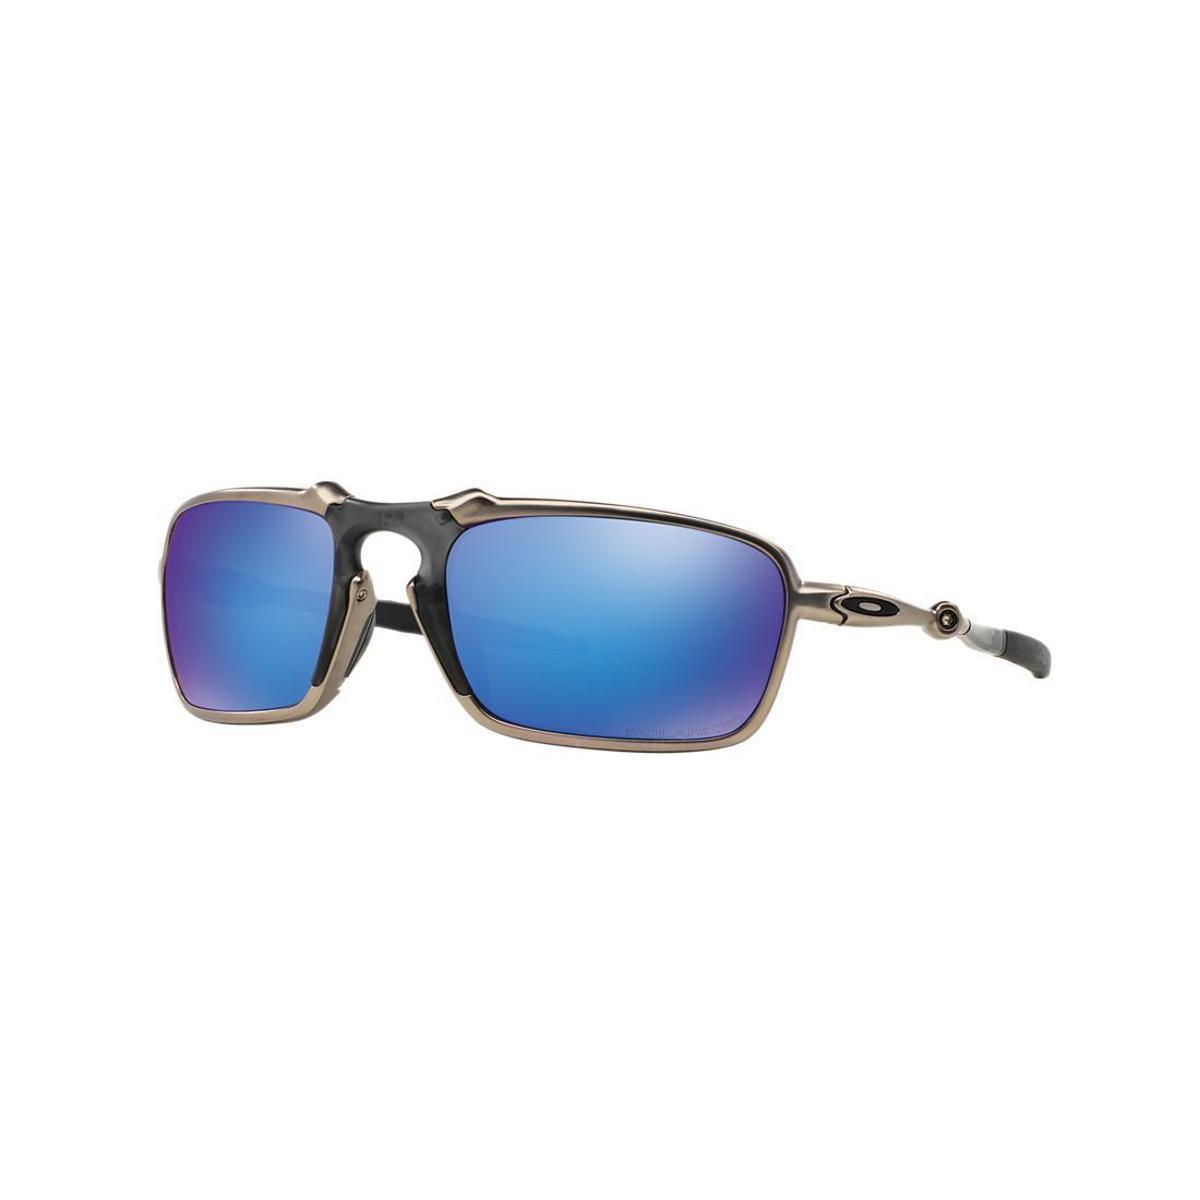 Óculos de Sol Oakley OO6020 Badman - Compre Agora   Zattini bc5cc8f6db